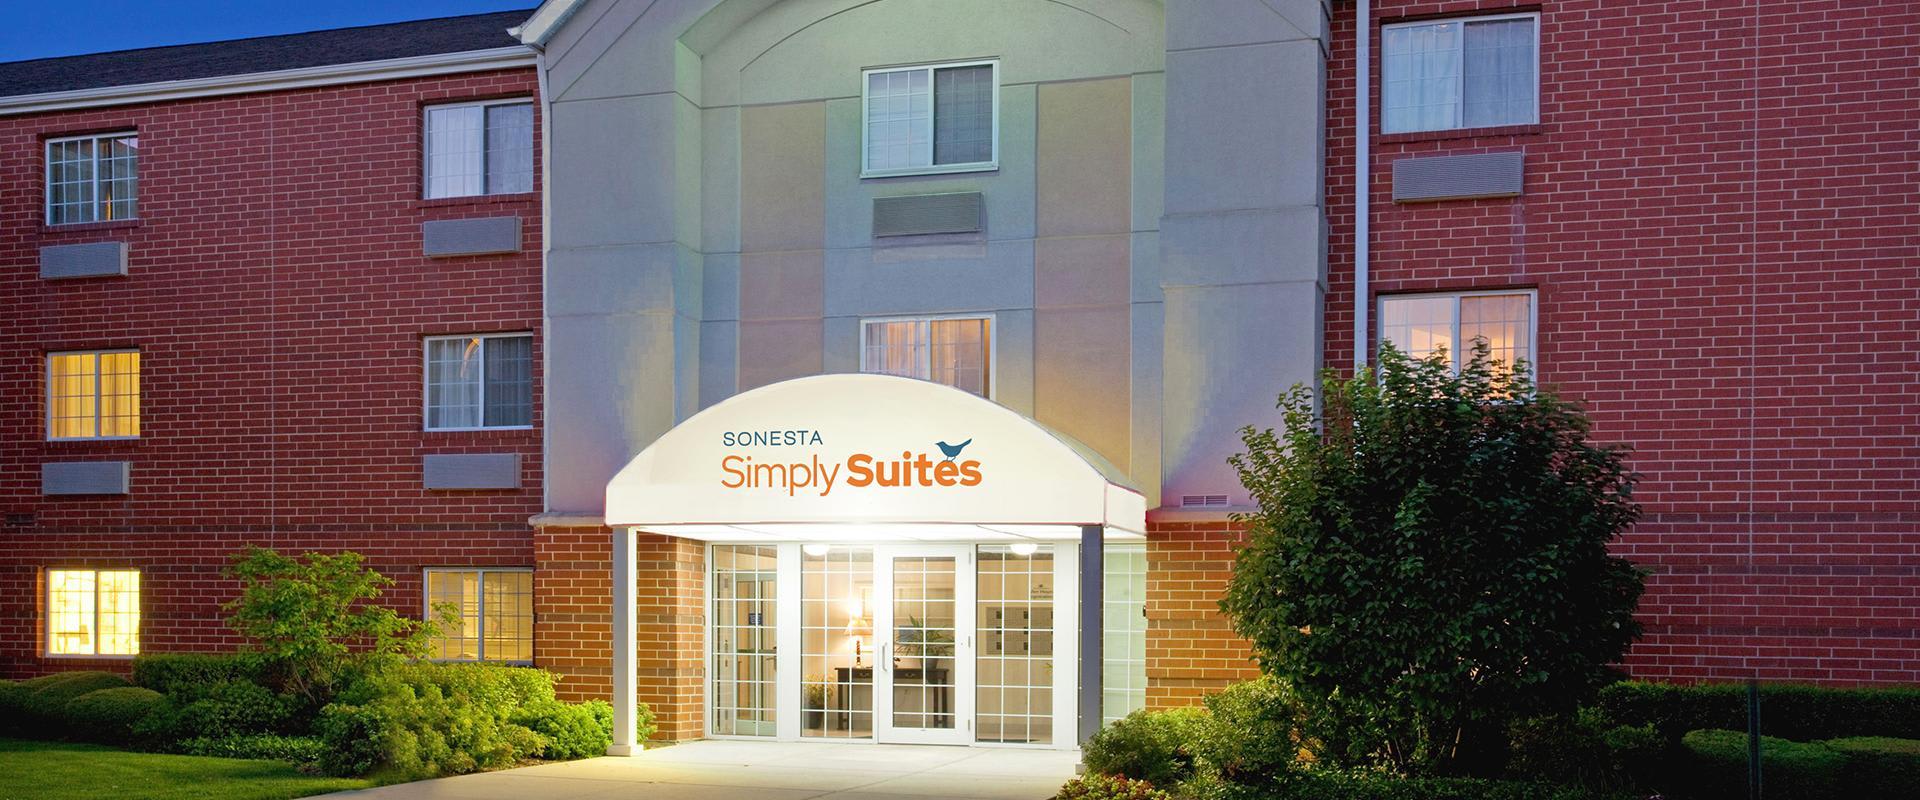 Sonesta Simply Suites Chicago Naperville Hotel Exterior Entrance